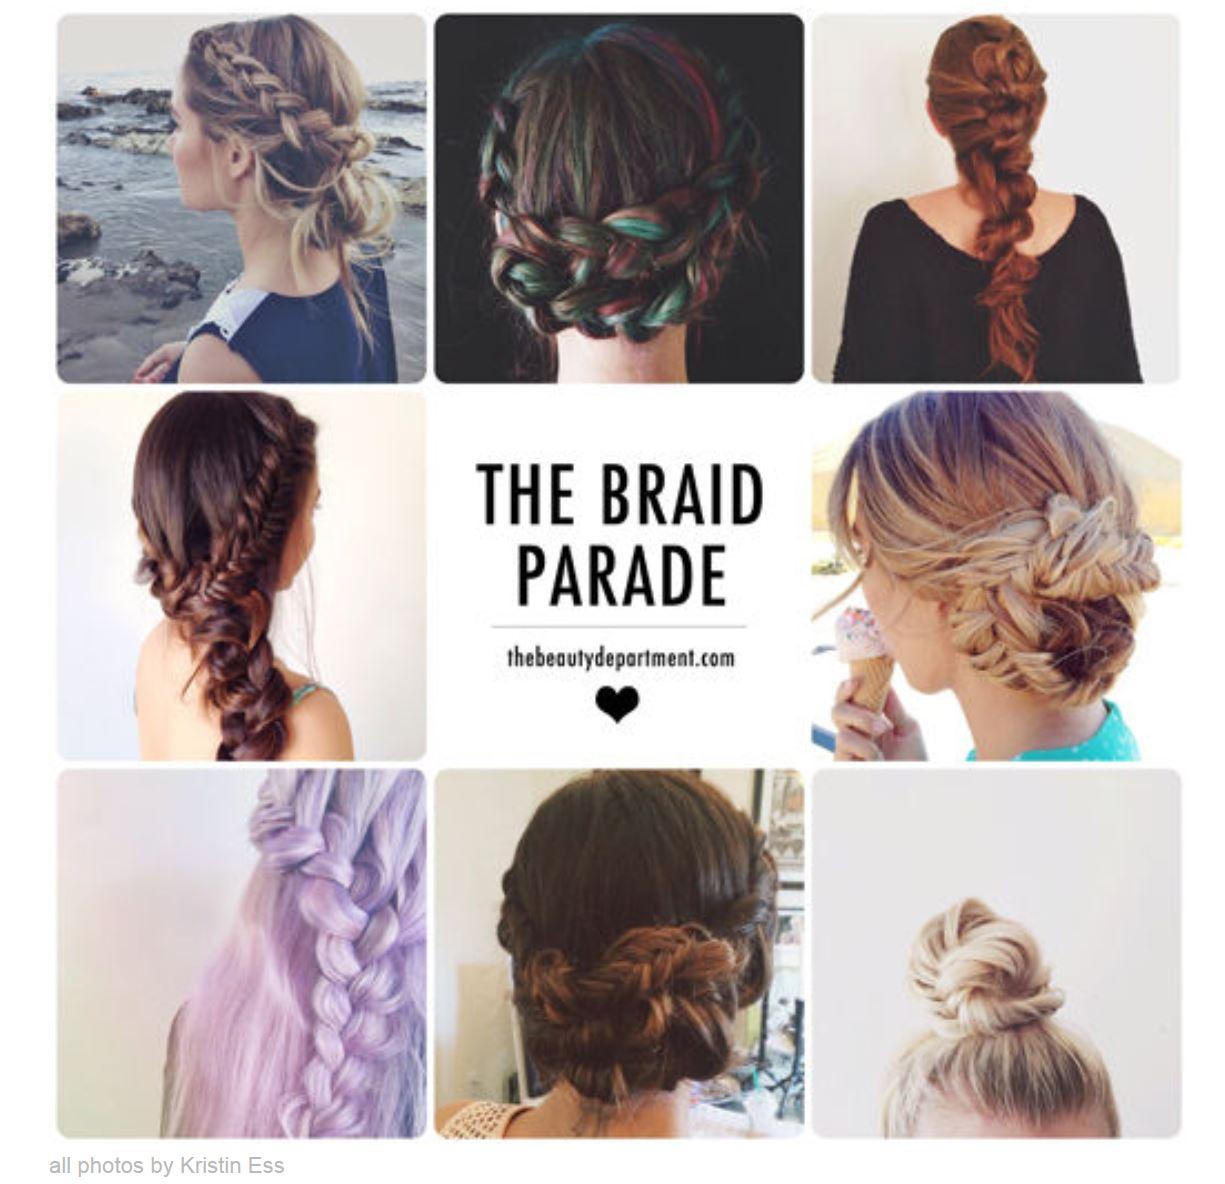 thebeautydepartement Sofy tipsar: hår/smink/skönhetsblogg